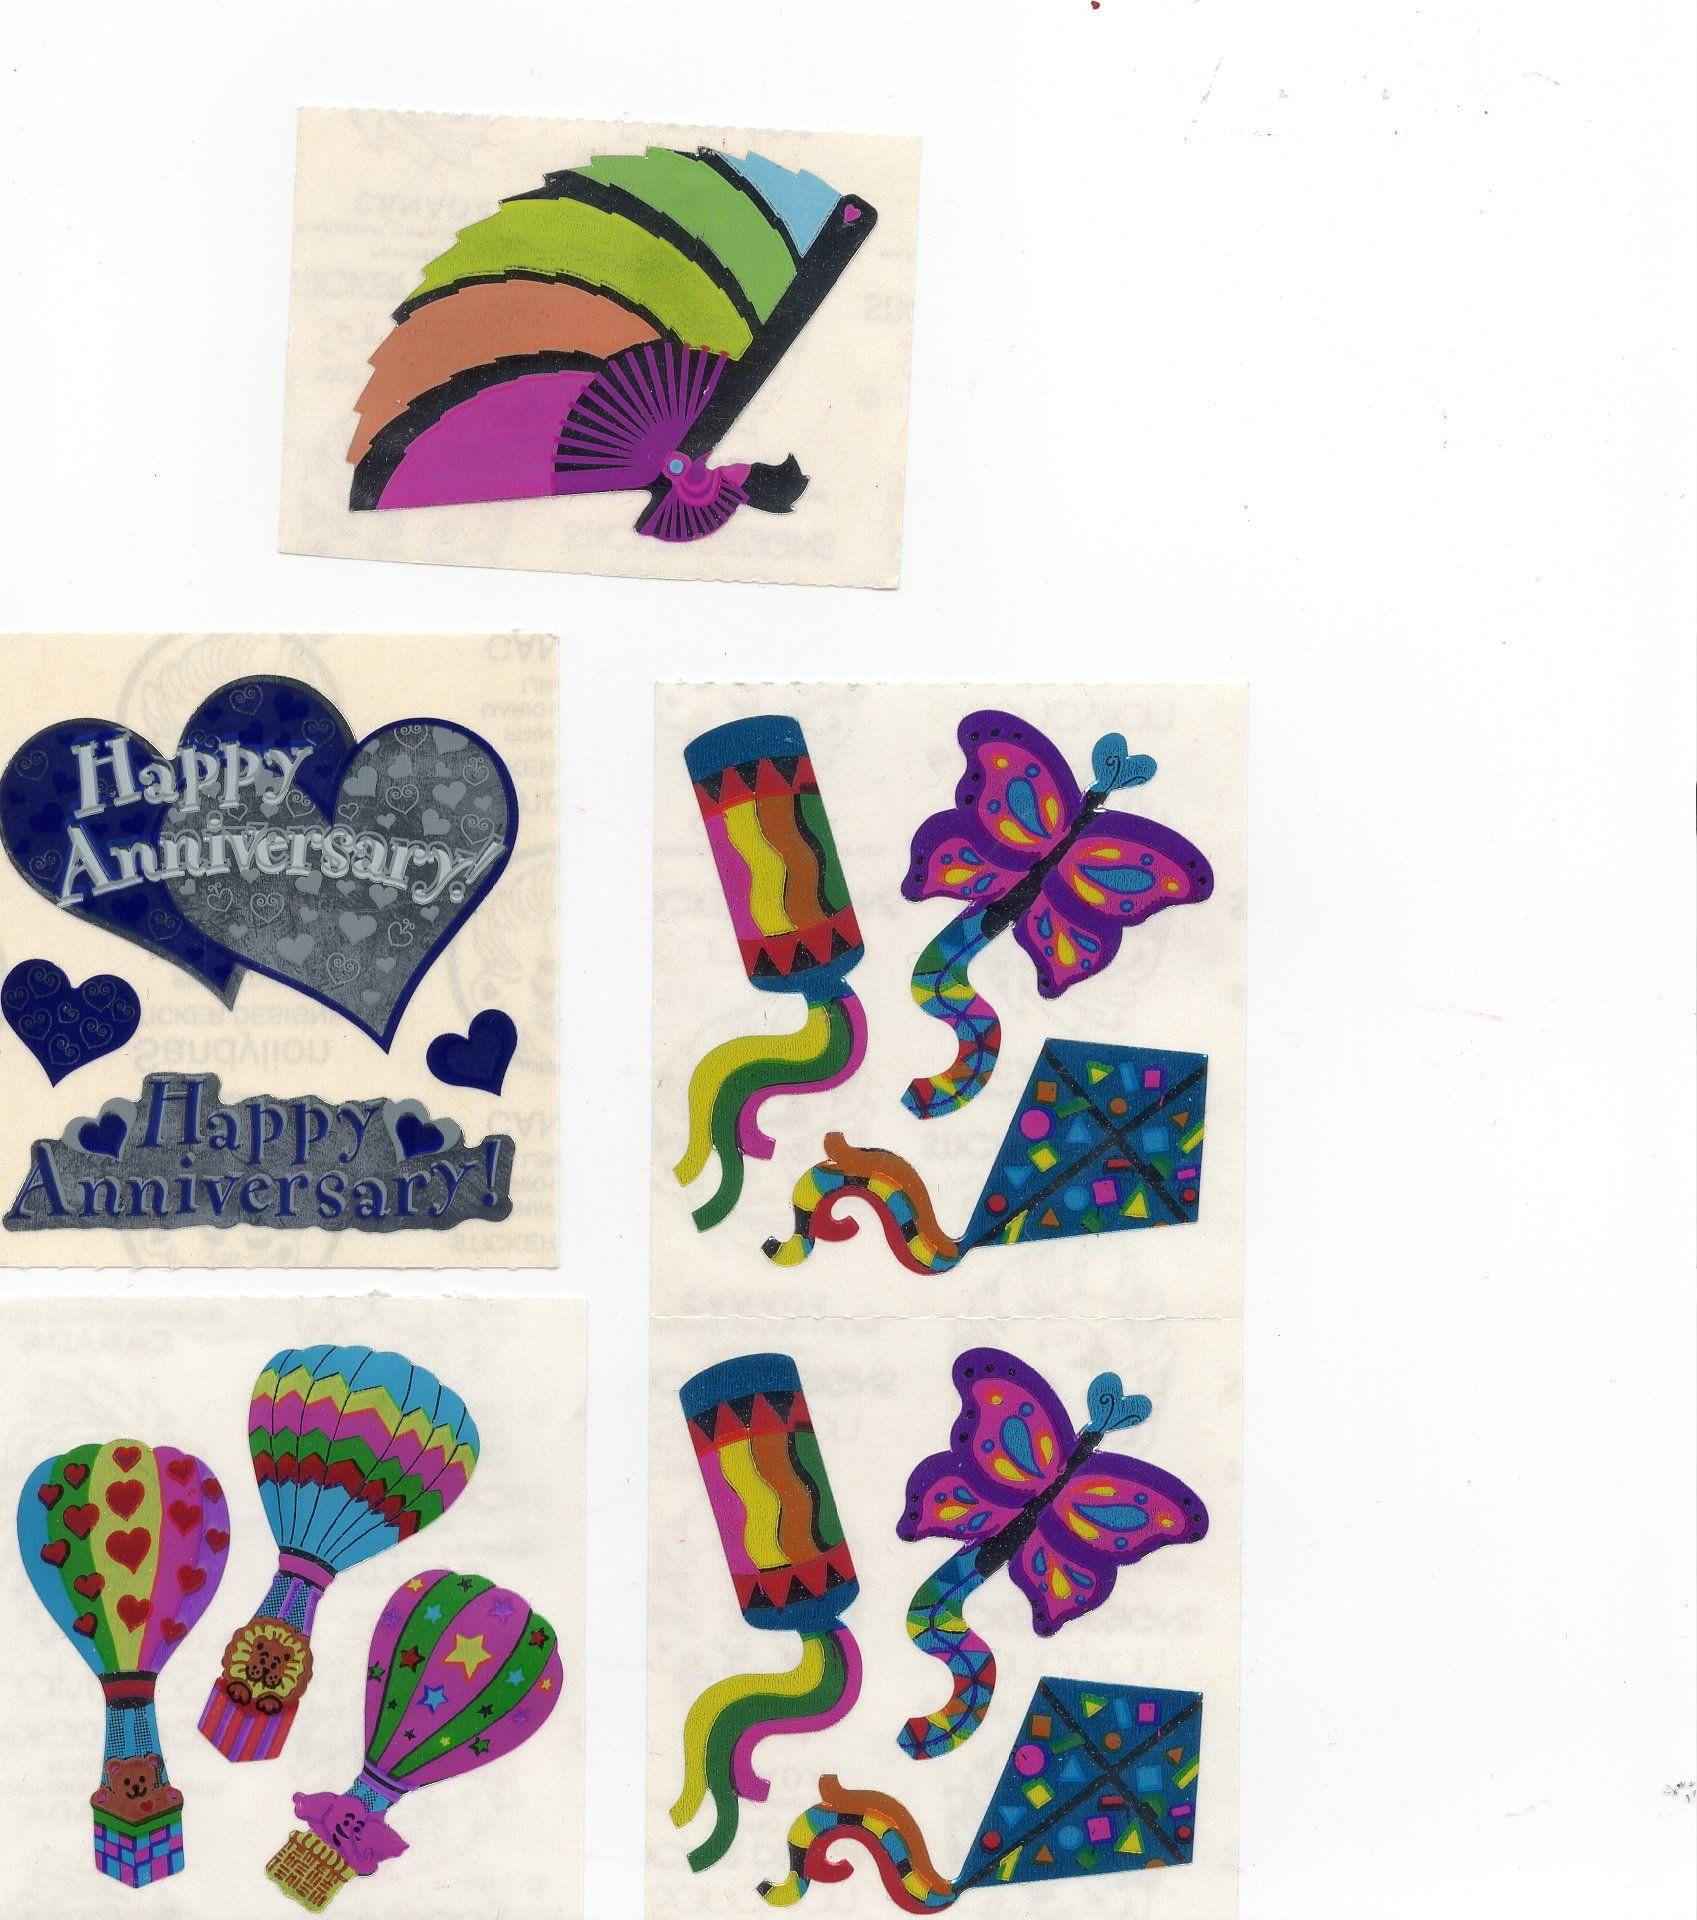 Sandylion OPAL KITES 1 Square Vintage Opal Colorful Kites Stickers